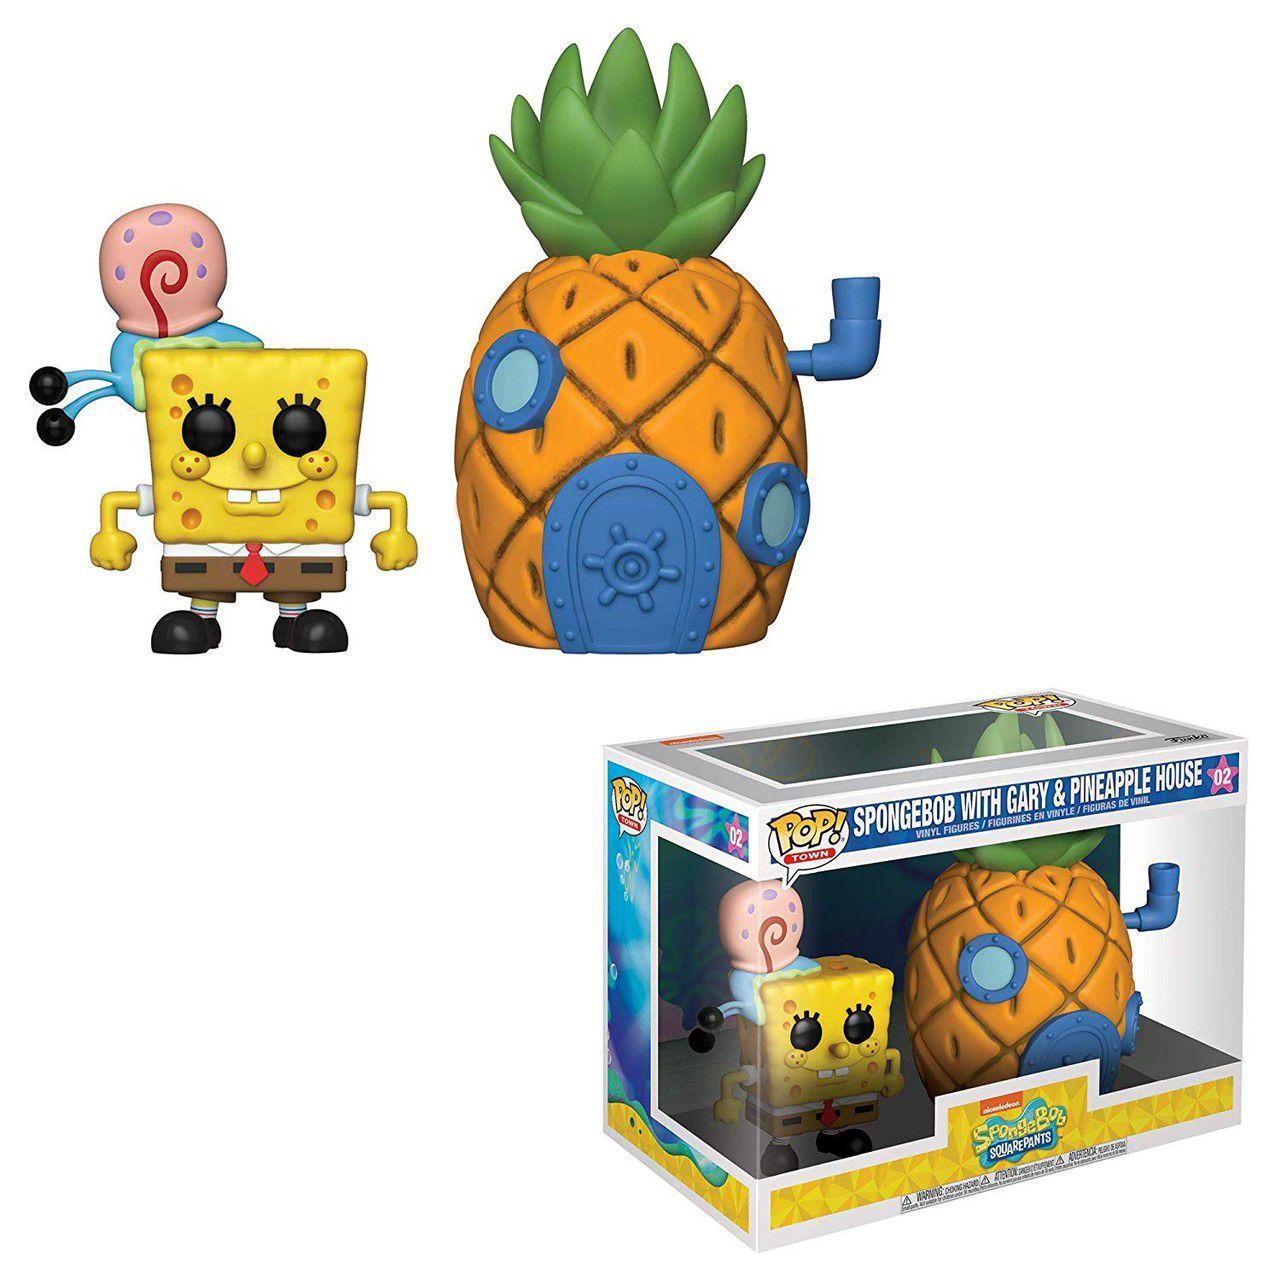 Funko Pop! Town Bob Esponja (Spongebob With Gary & Pineapple House): Bob Esponja Calça-Quadrada  #02 - Funko